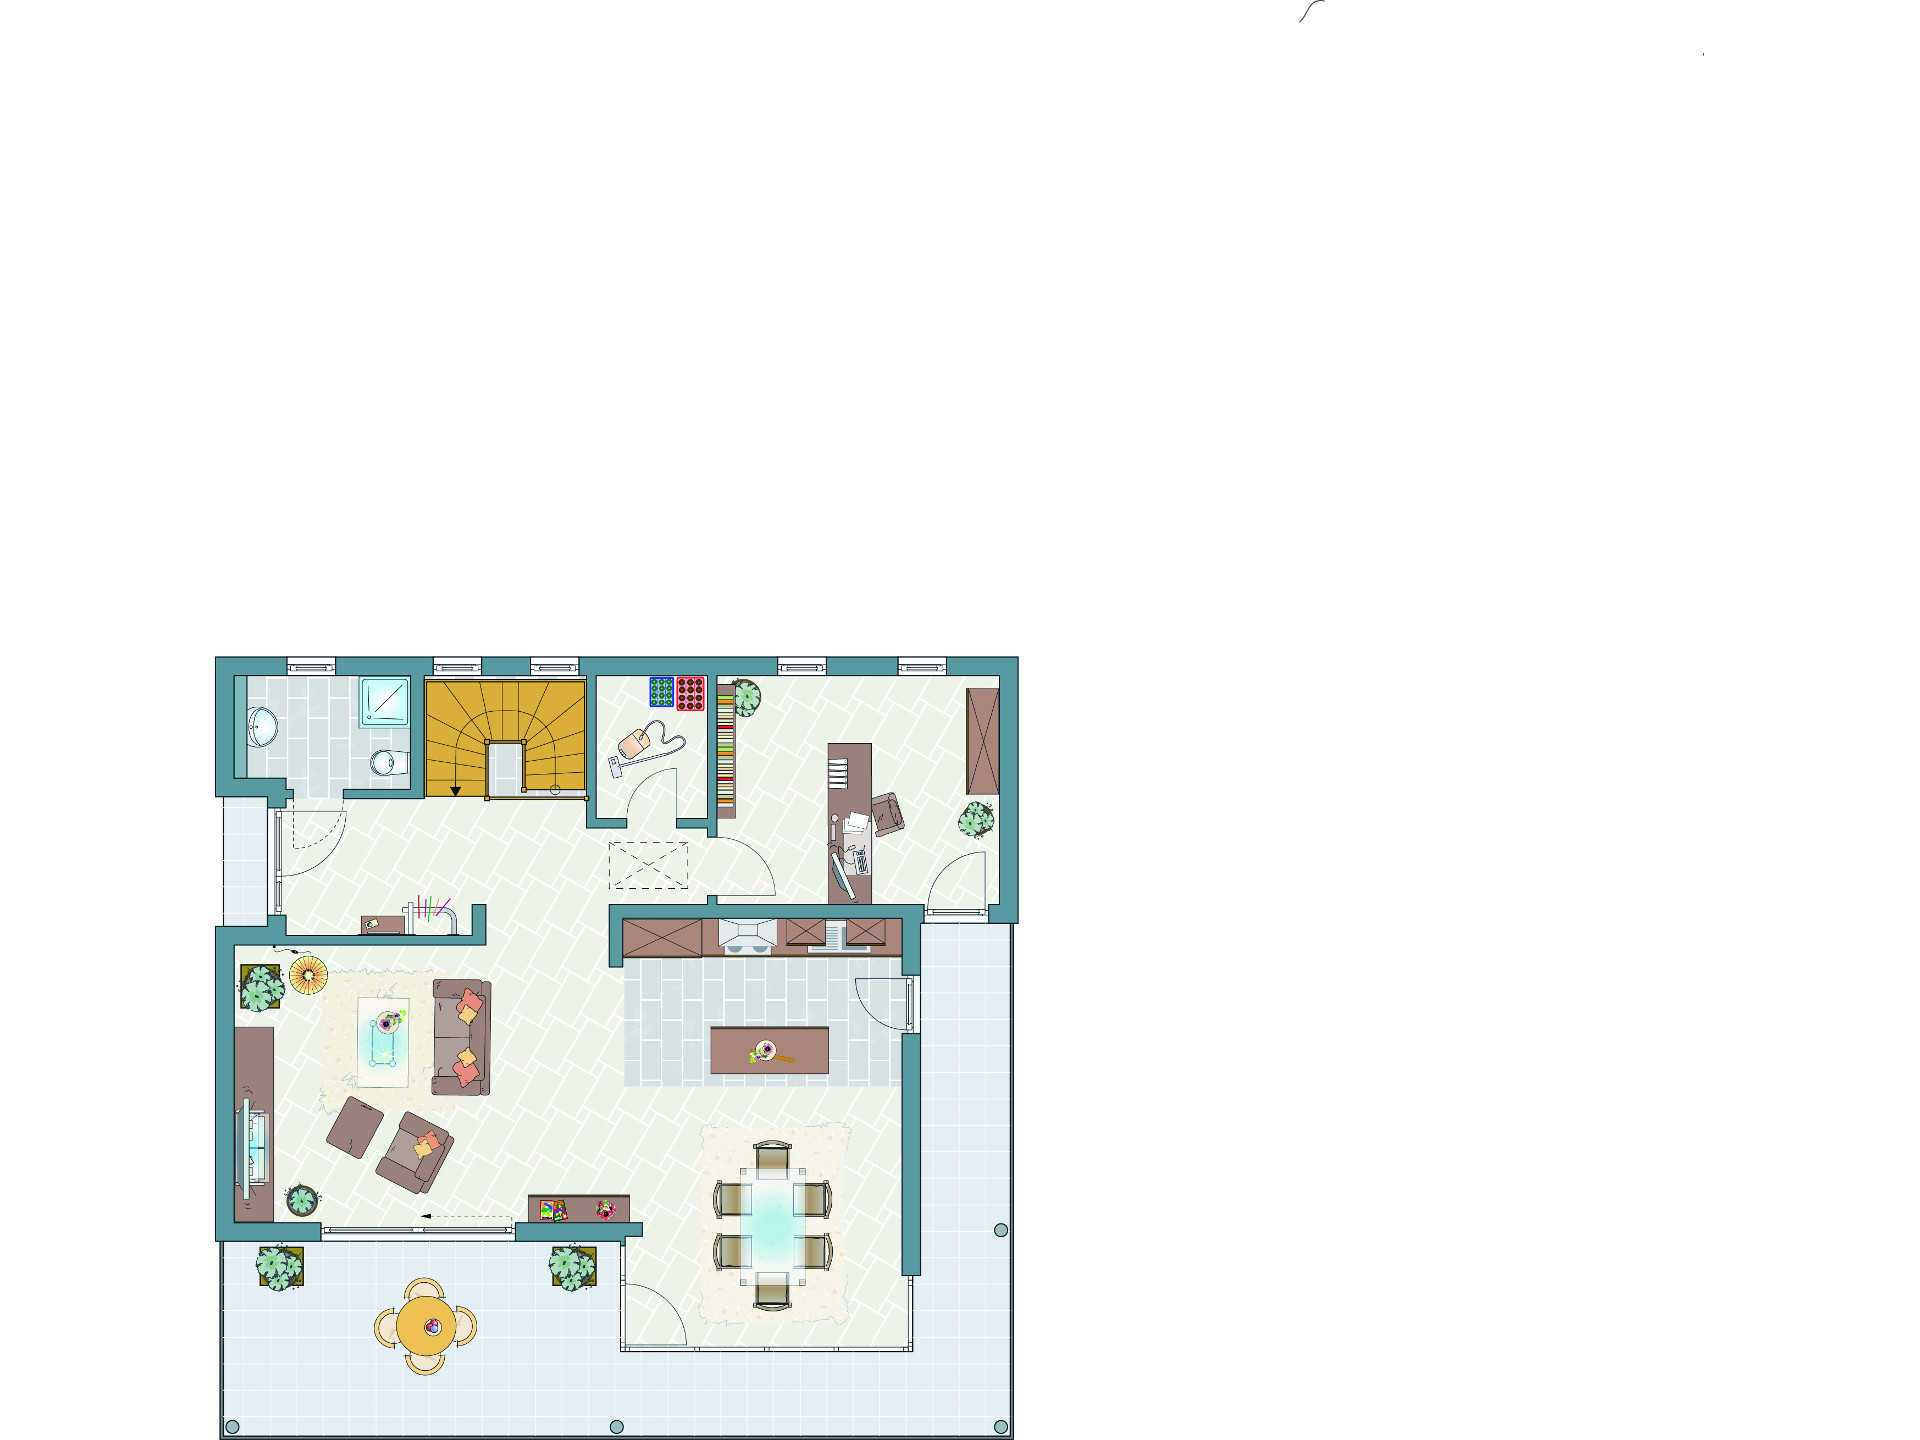 Grundriss Frei geplantes Kundenhaus exklusiv